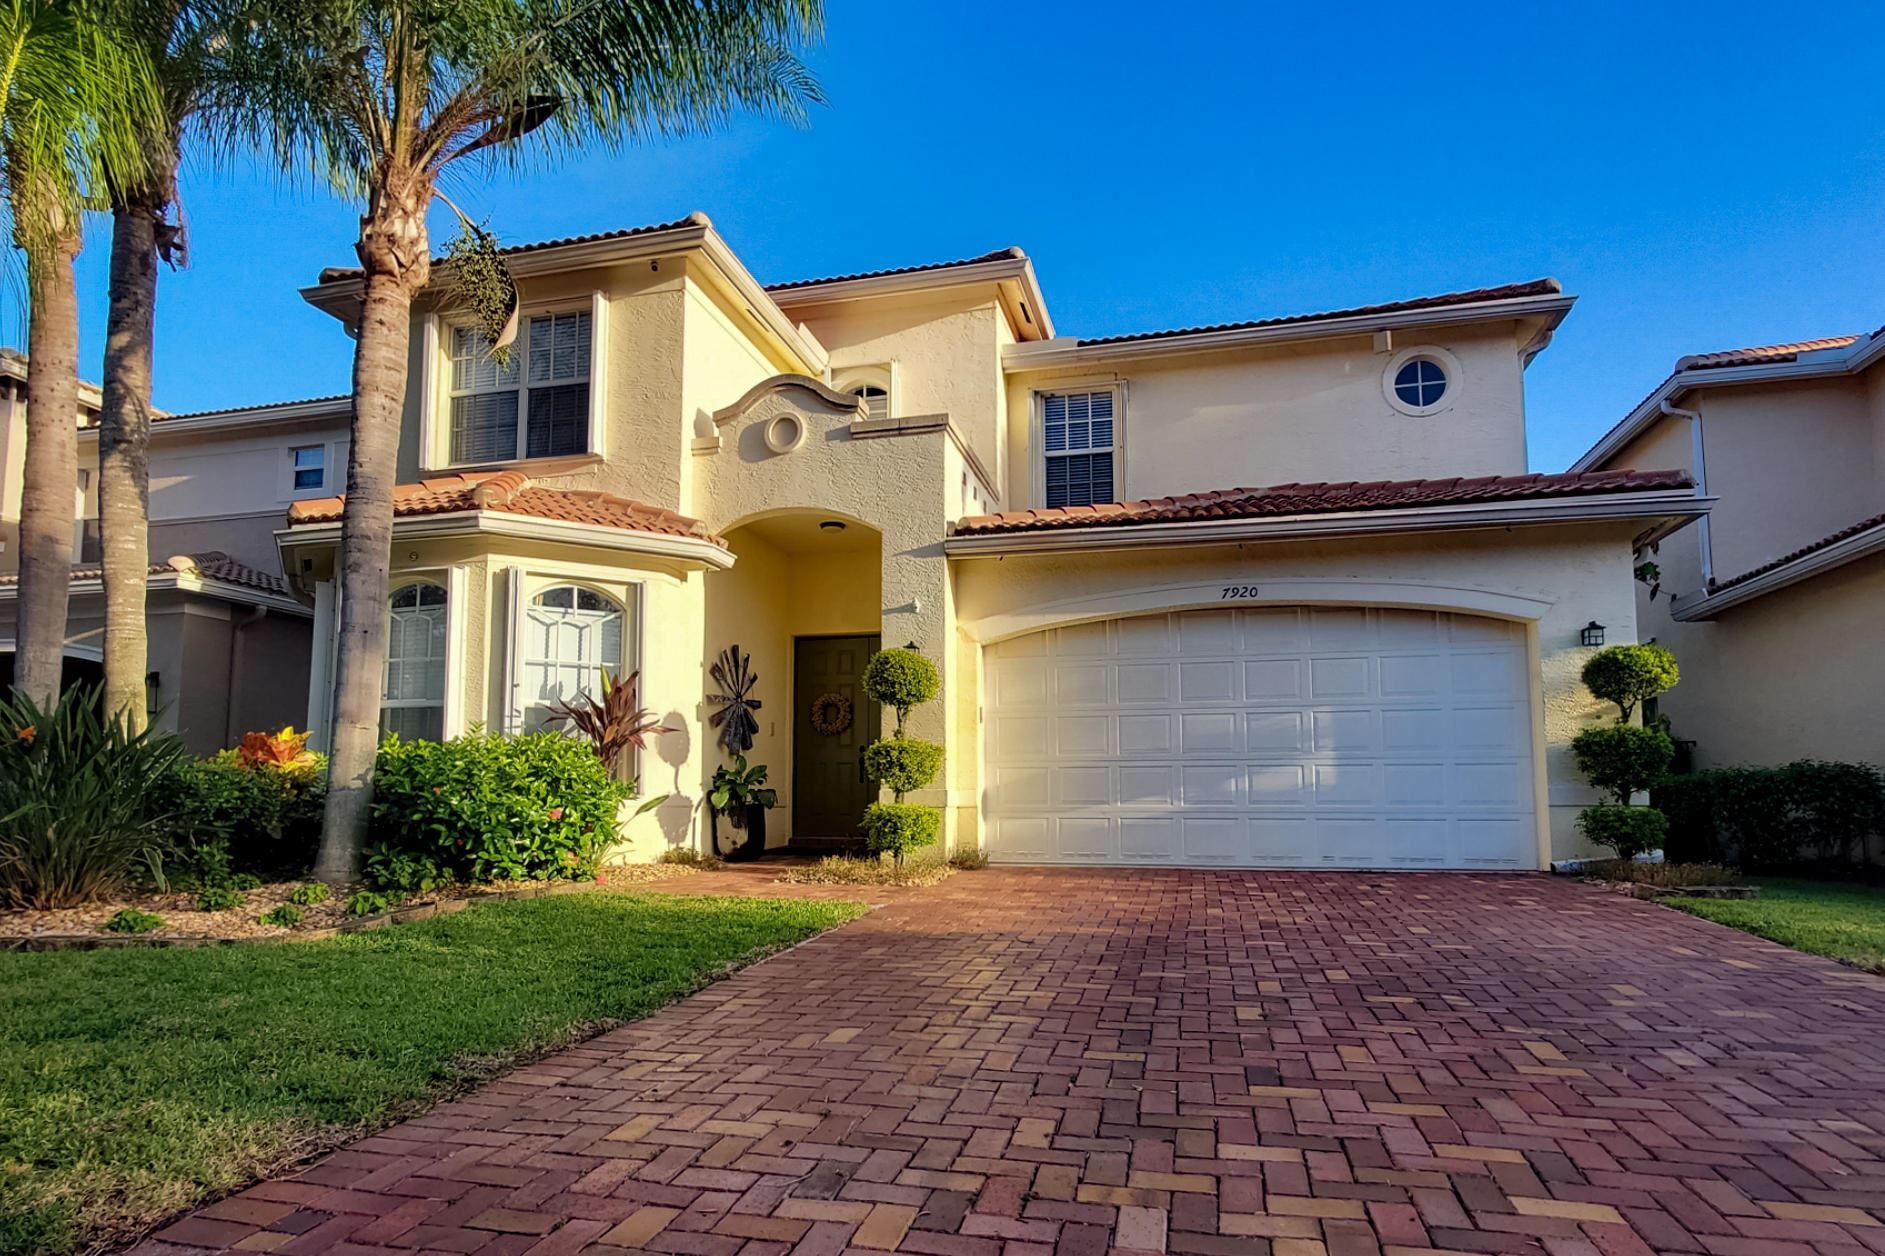 7920 Emerald Winds Circle, Boynton Beach, FL 33473 - MLS#: RX-10733532